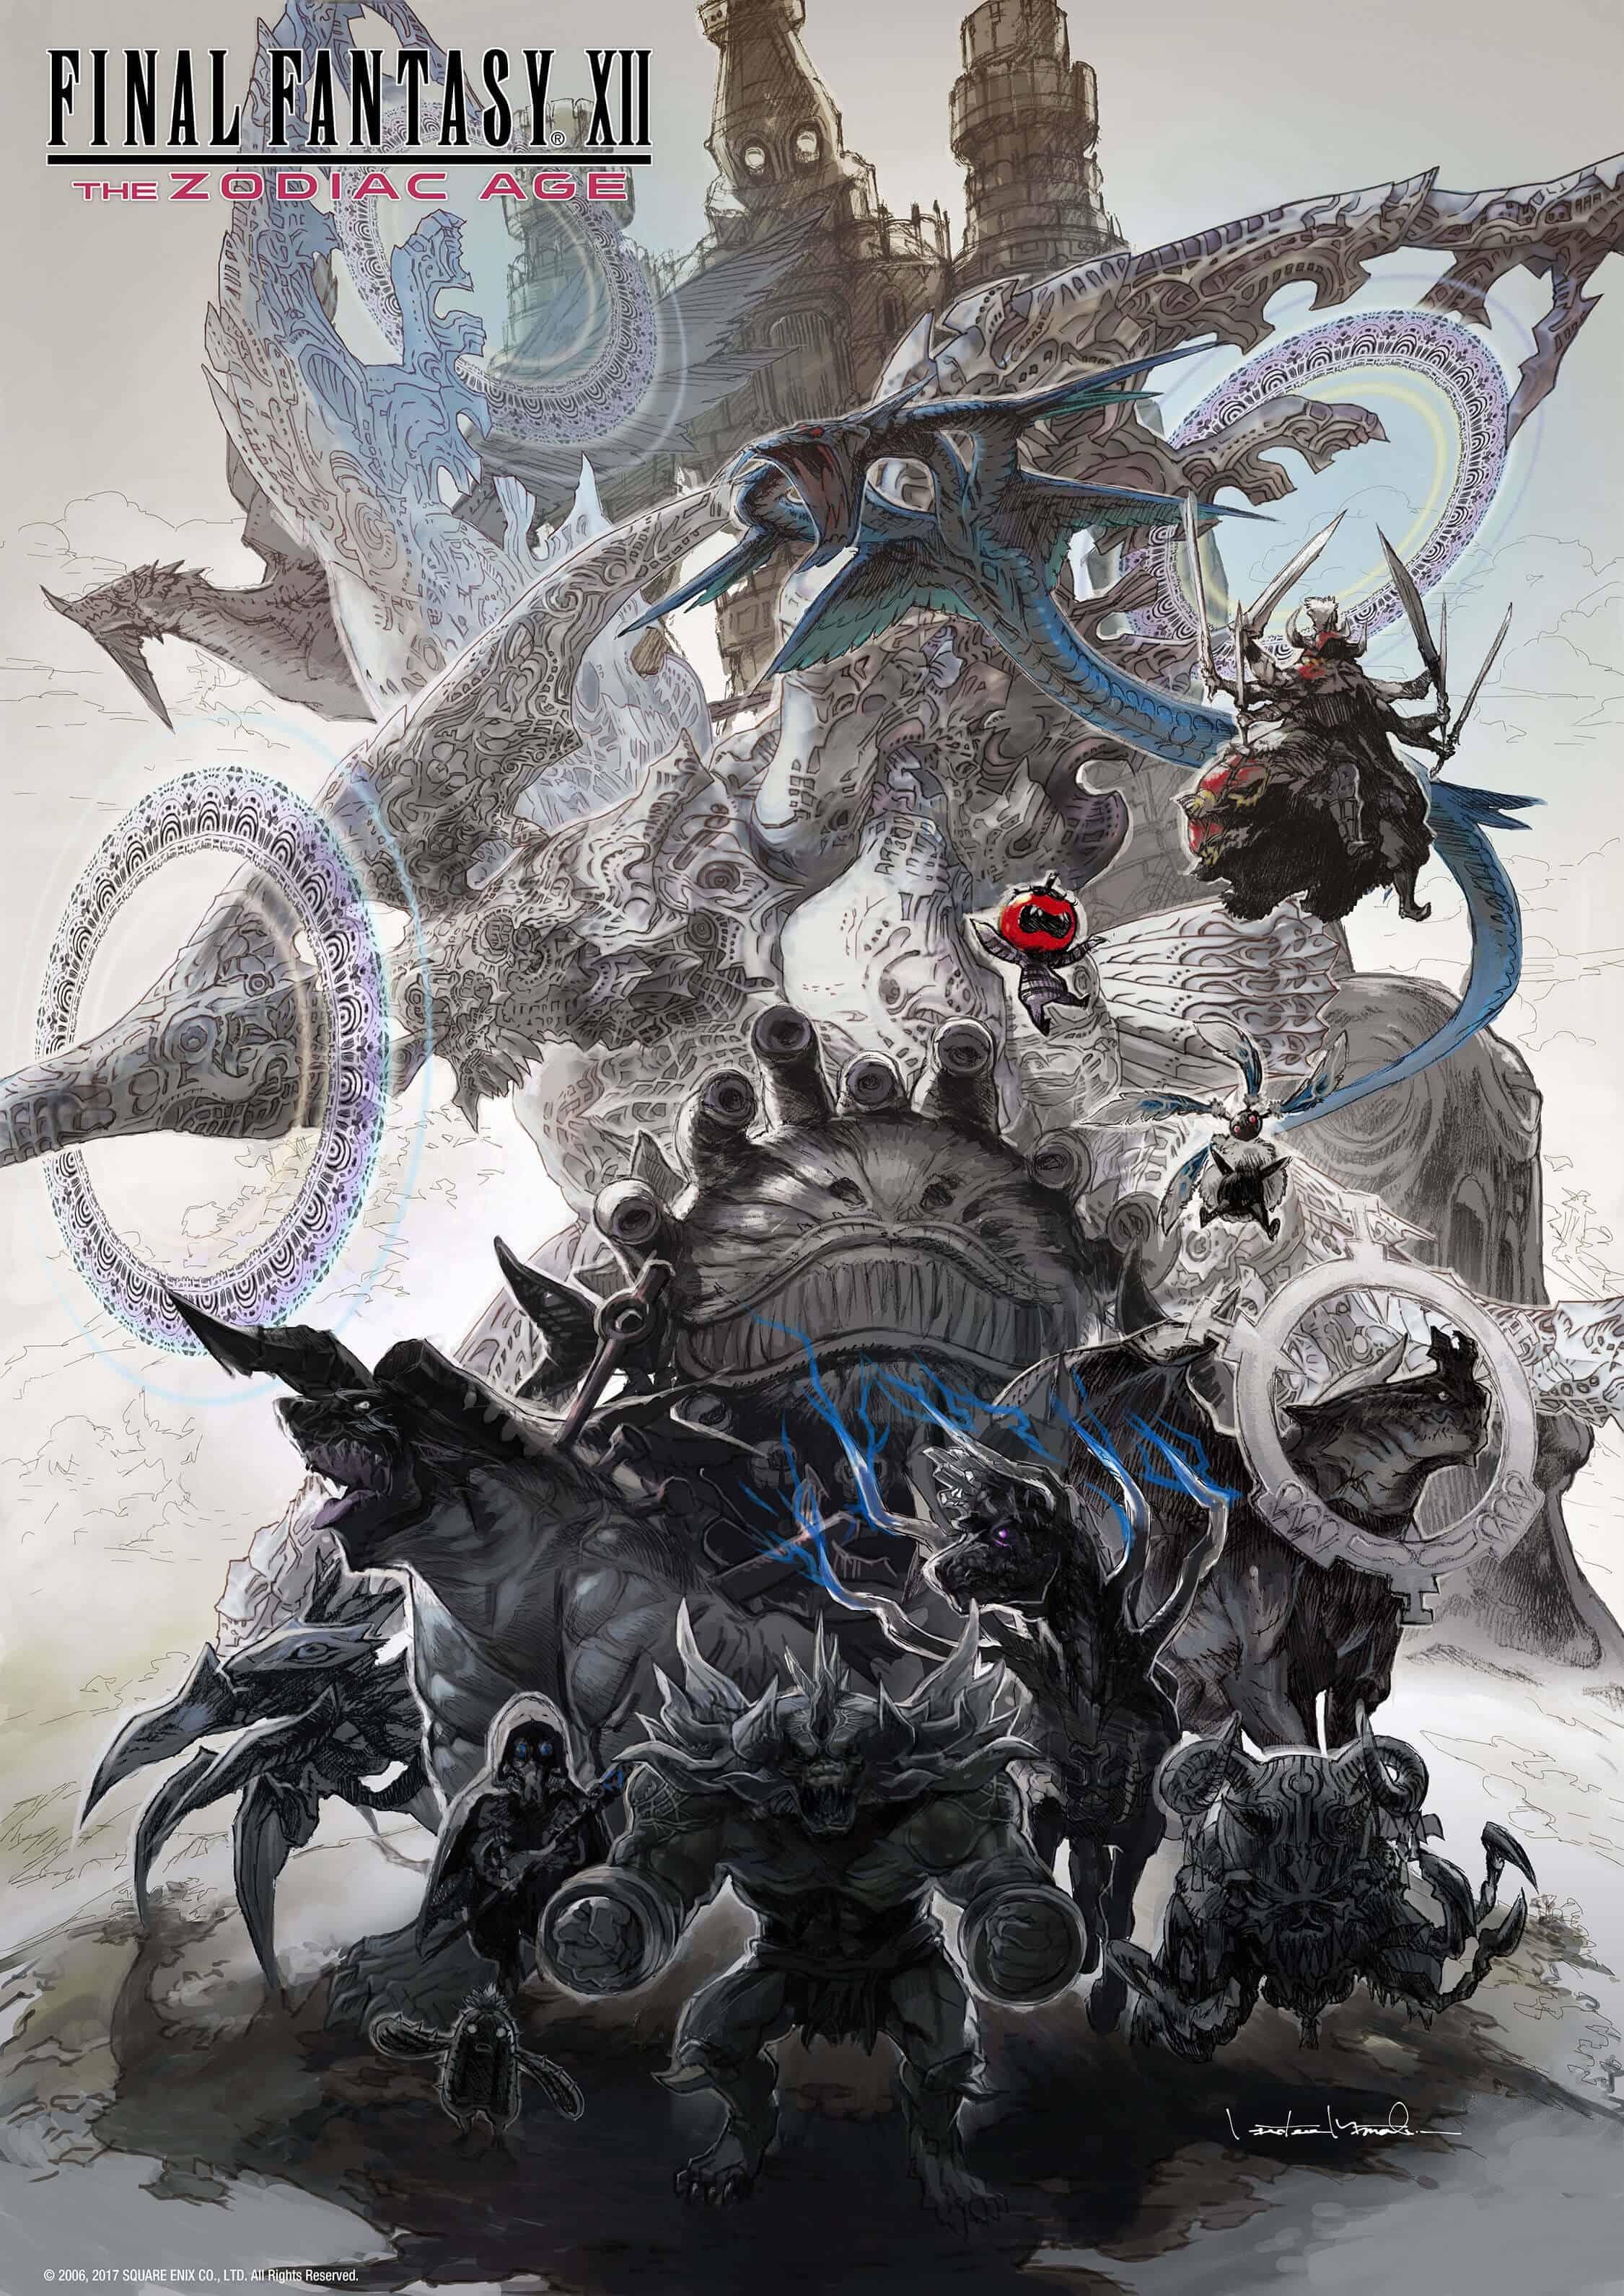 The making of Final Fantasy XII – Final Fantasy Fan Club VN